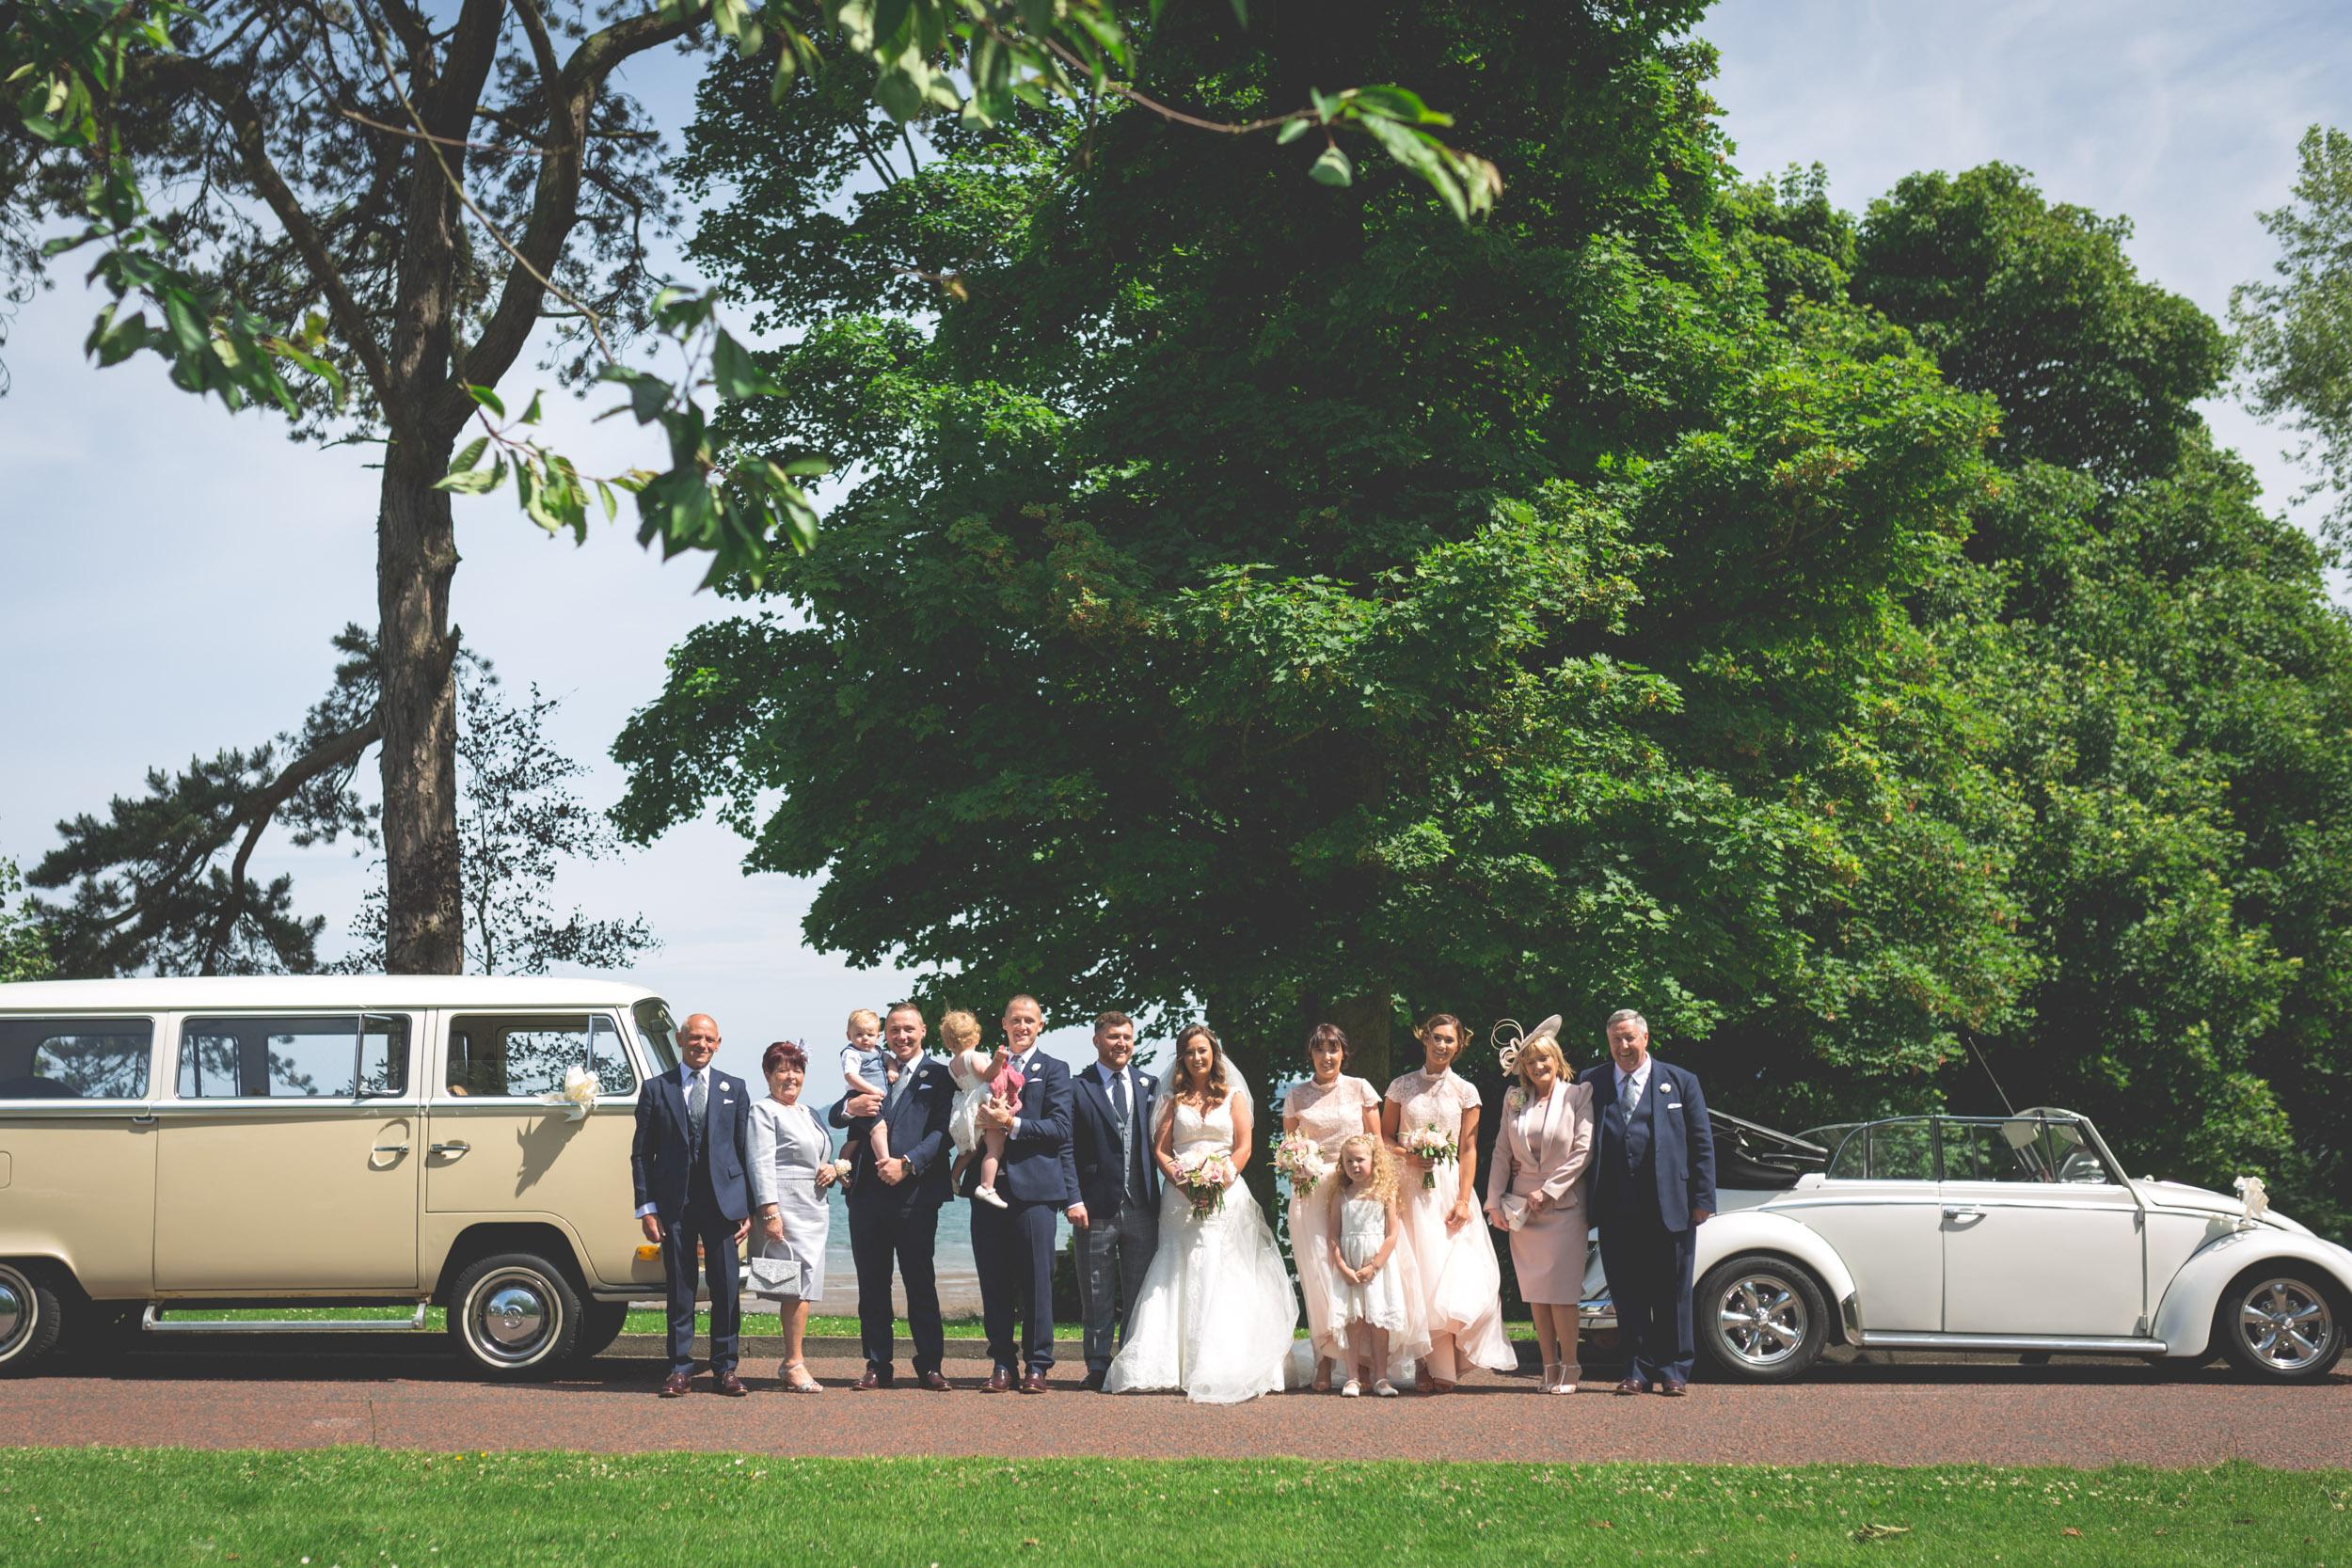 Brian McEwan   Northern Ireland Wedding Photographer   Rebecca & Michael   Portraits-7.jpg